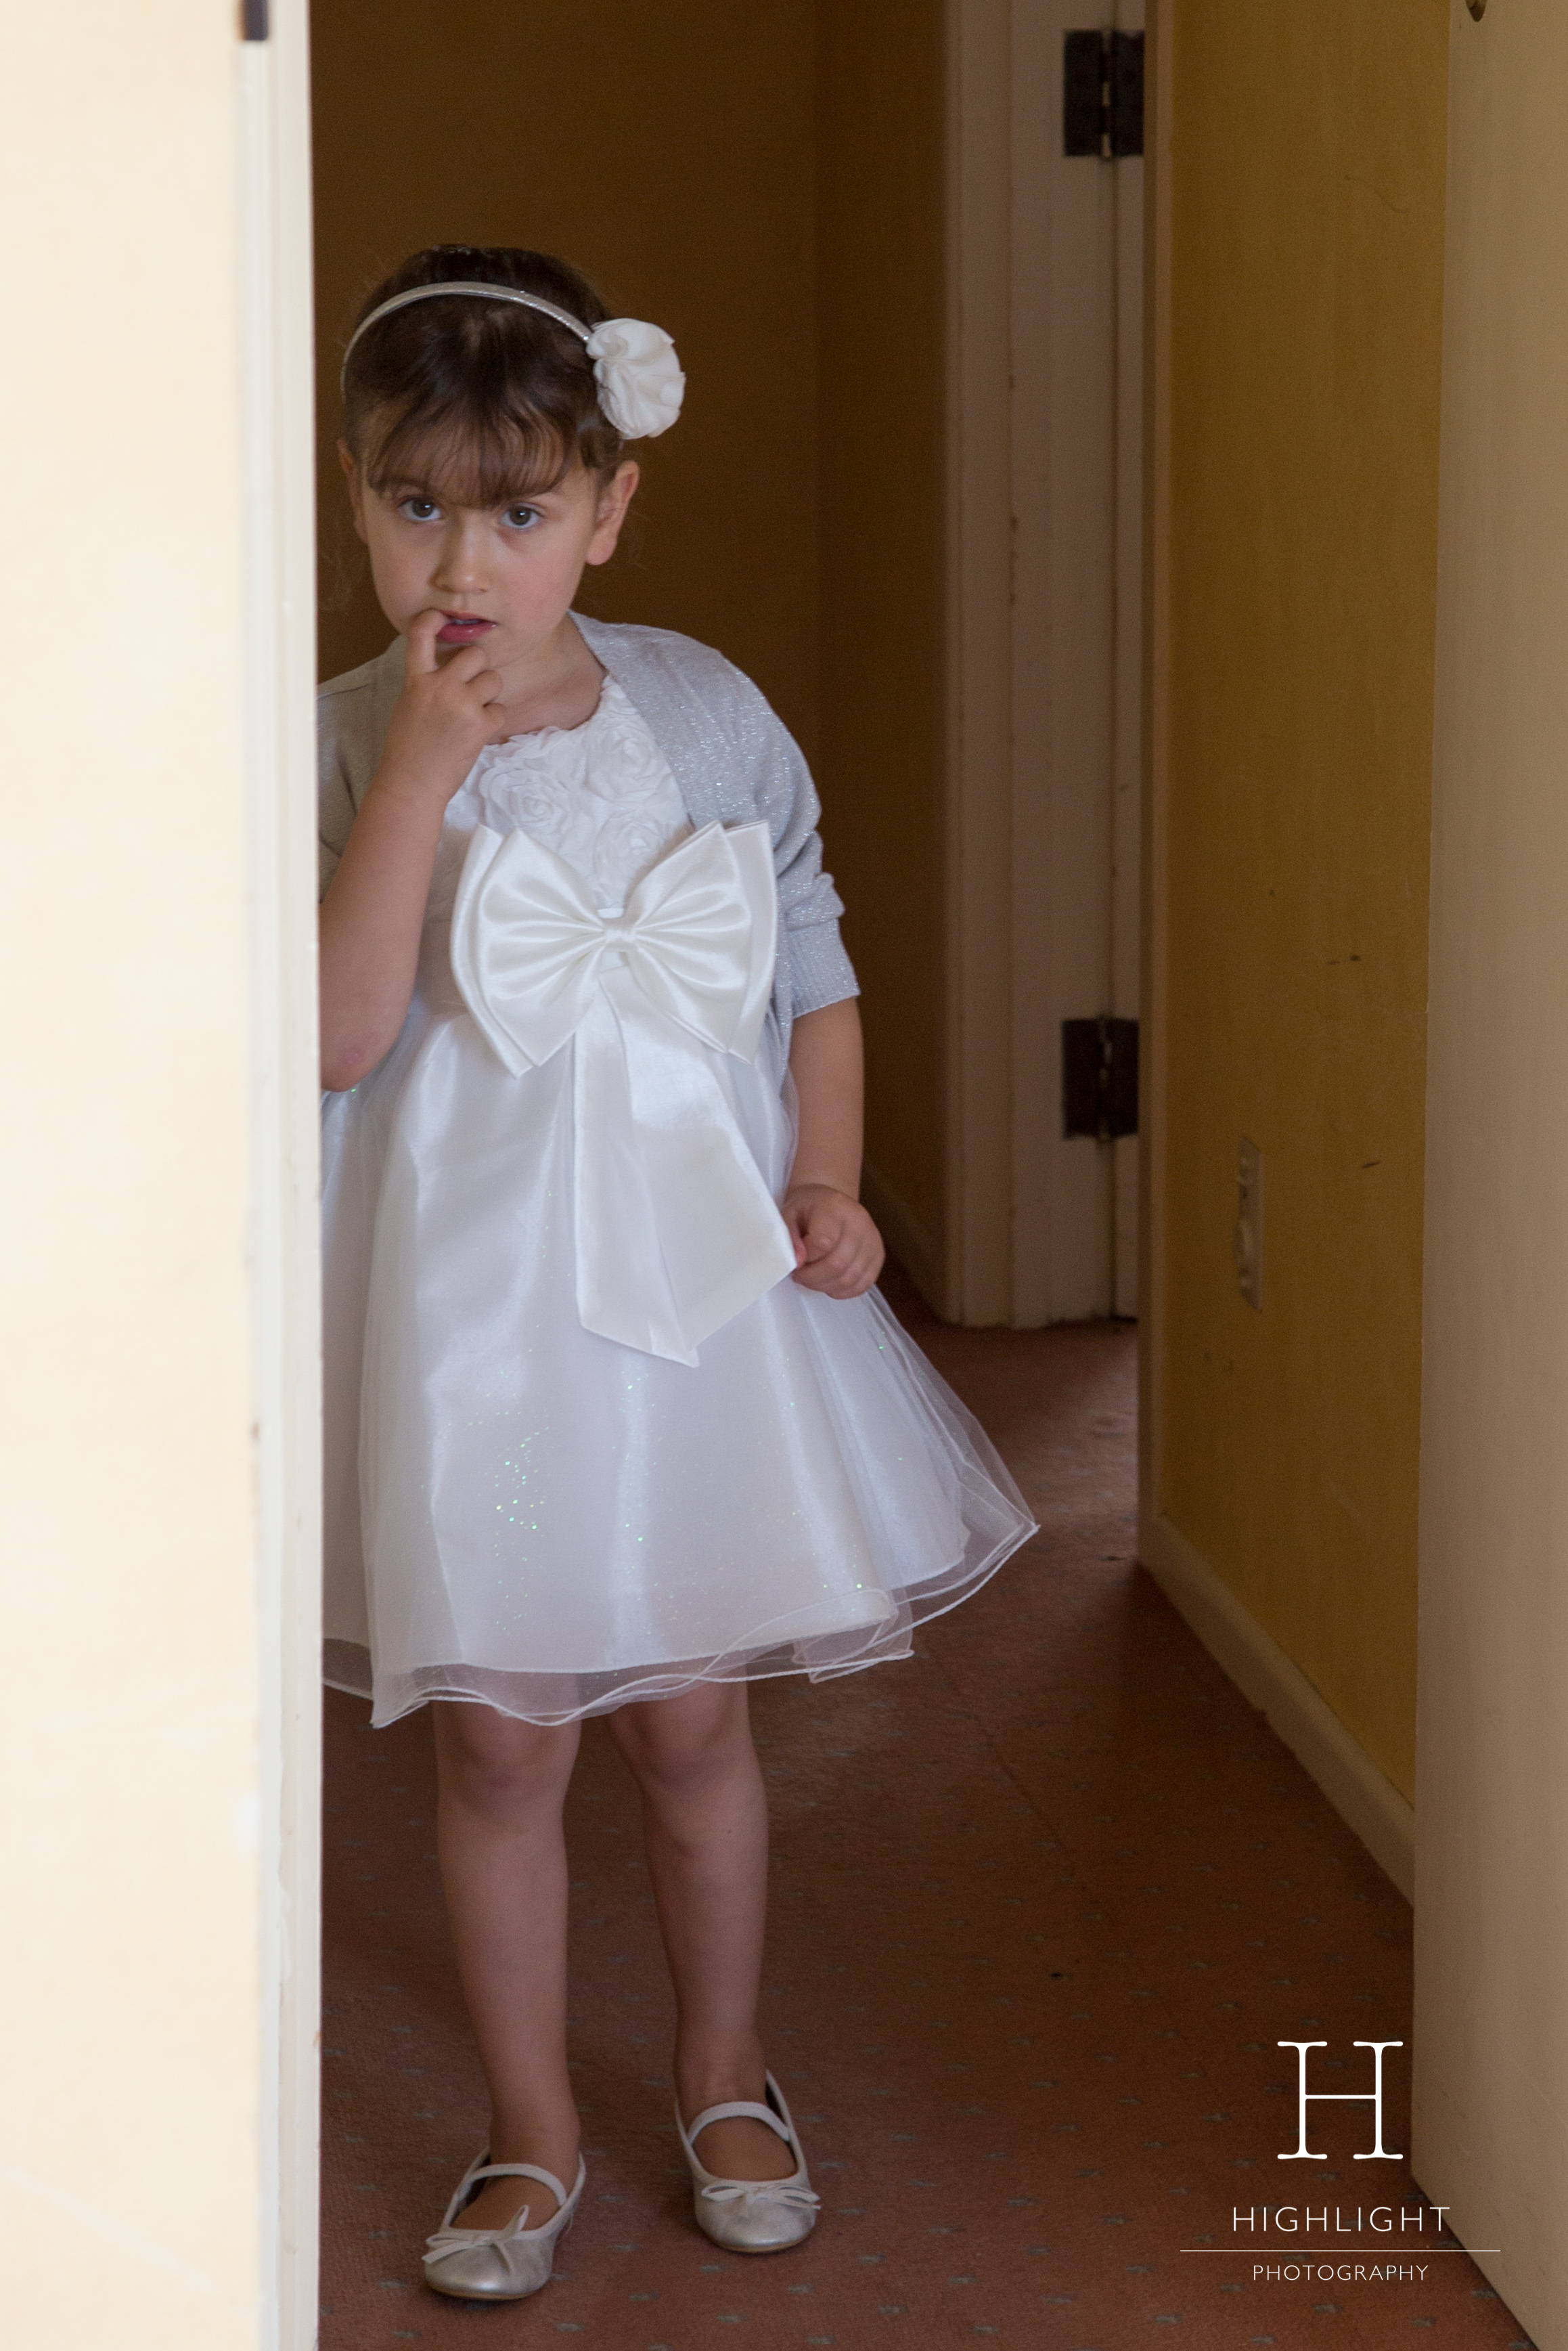 highlight_photography_wedding_new_zealand_white_dress.jpg